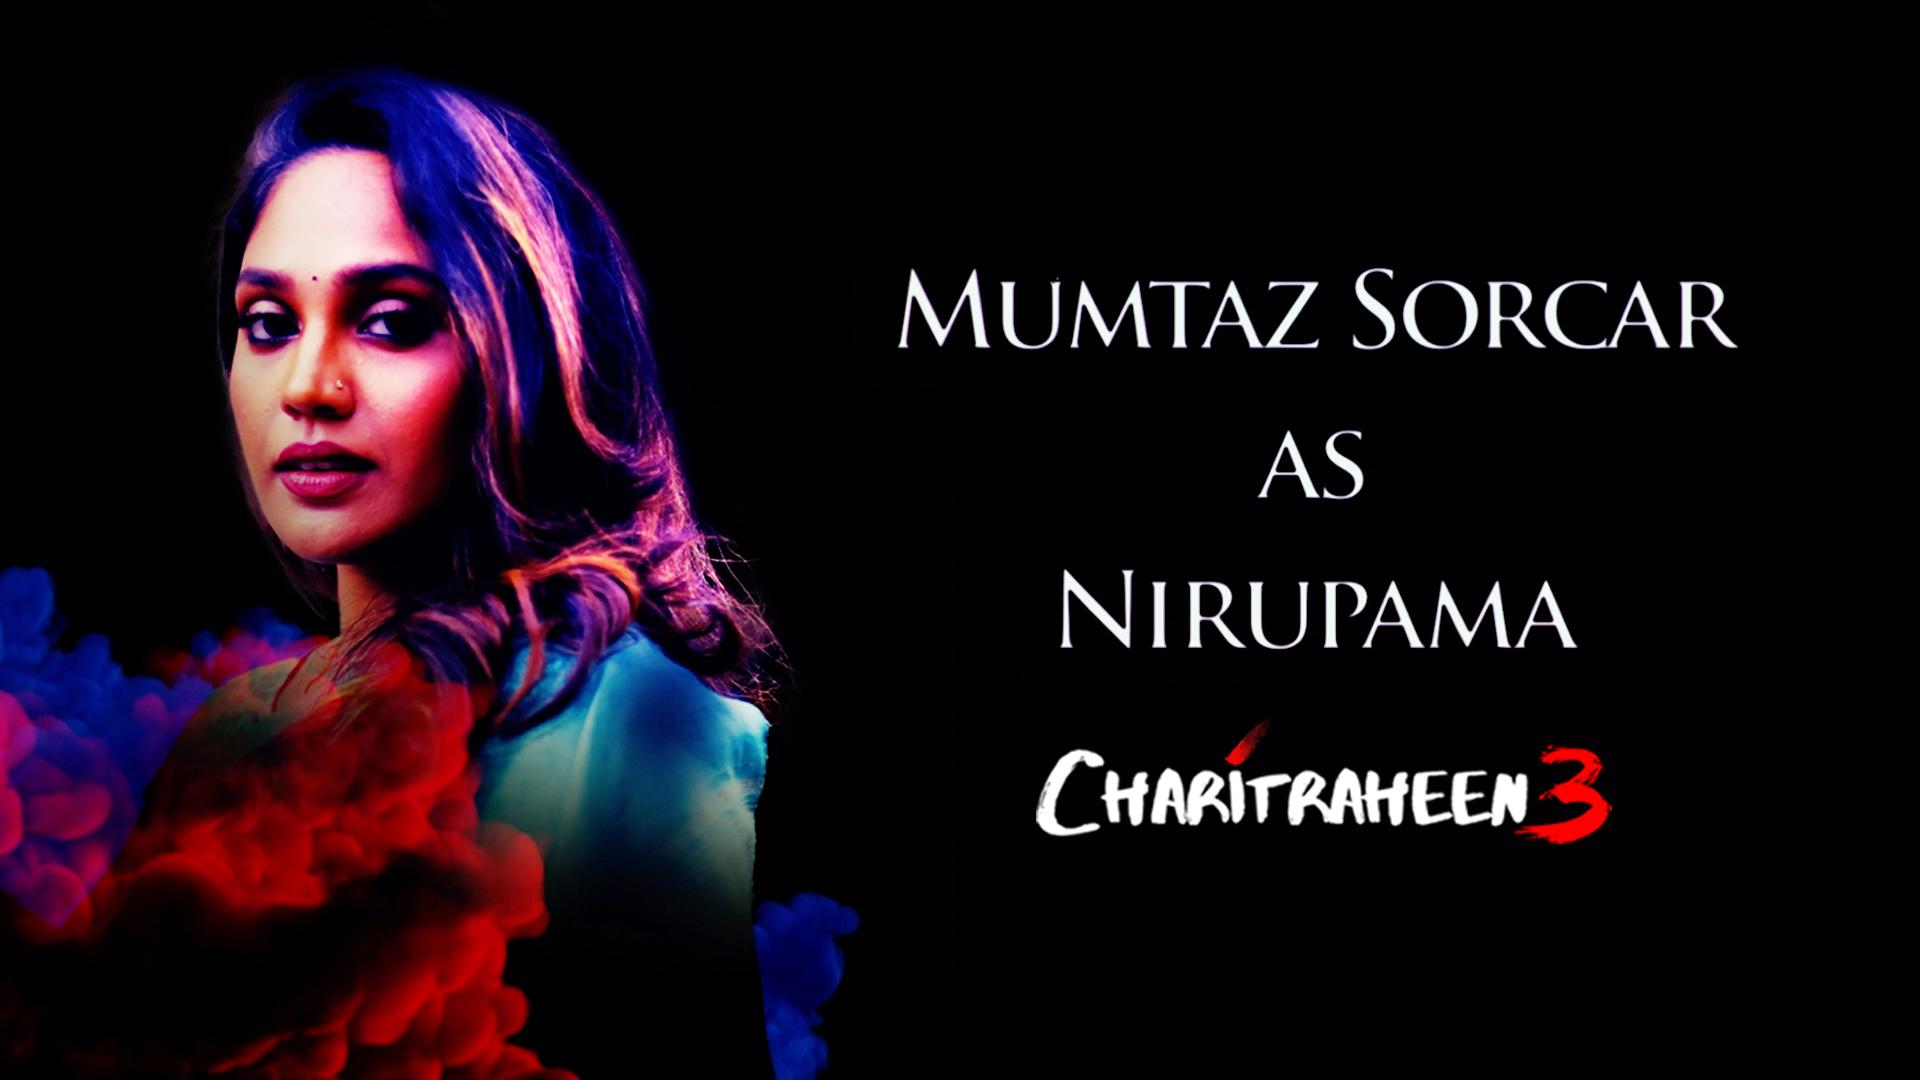 Charitraheen Season 3 Actress Mumtaz Sorcar